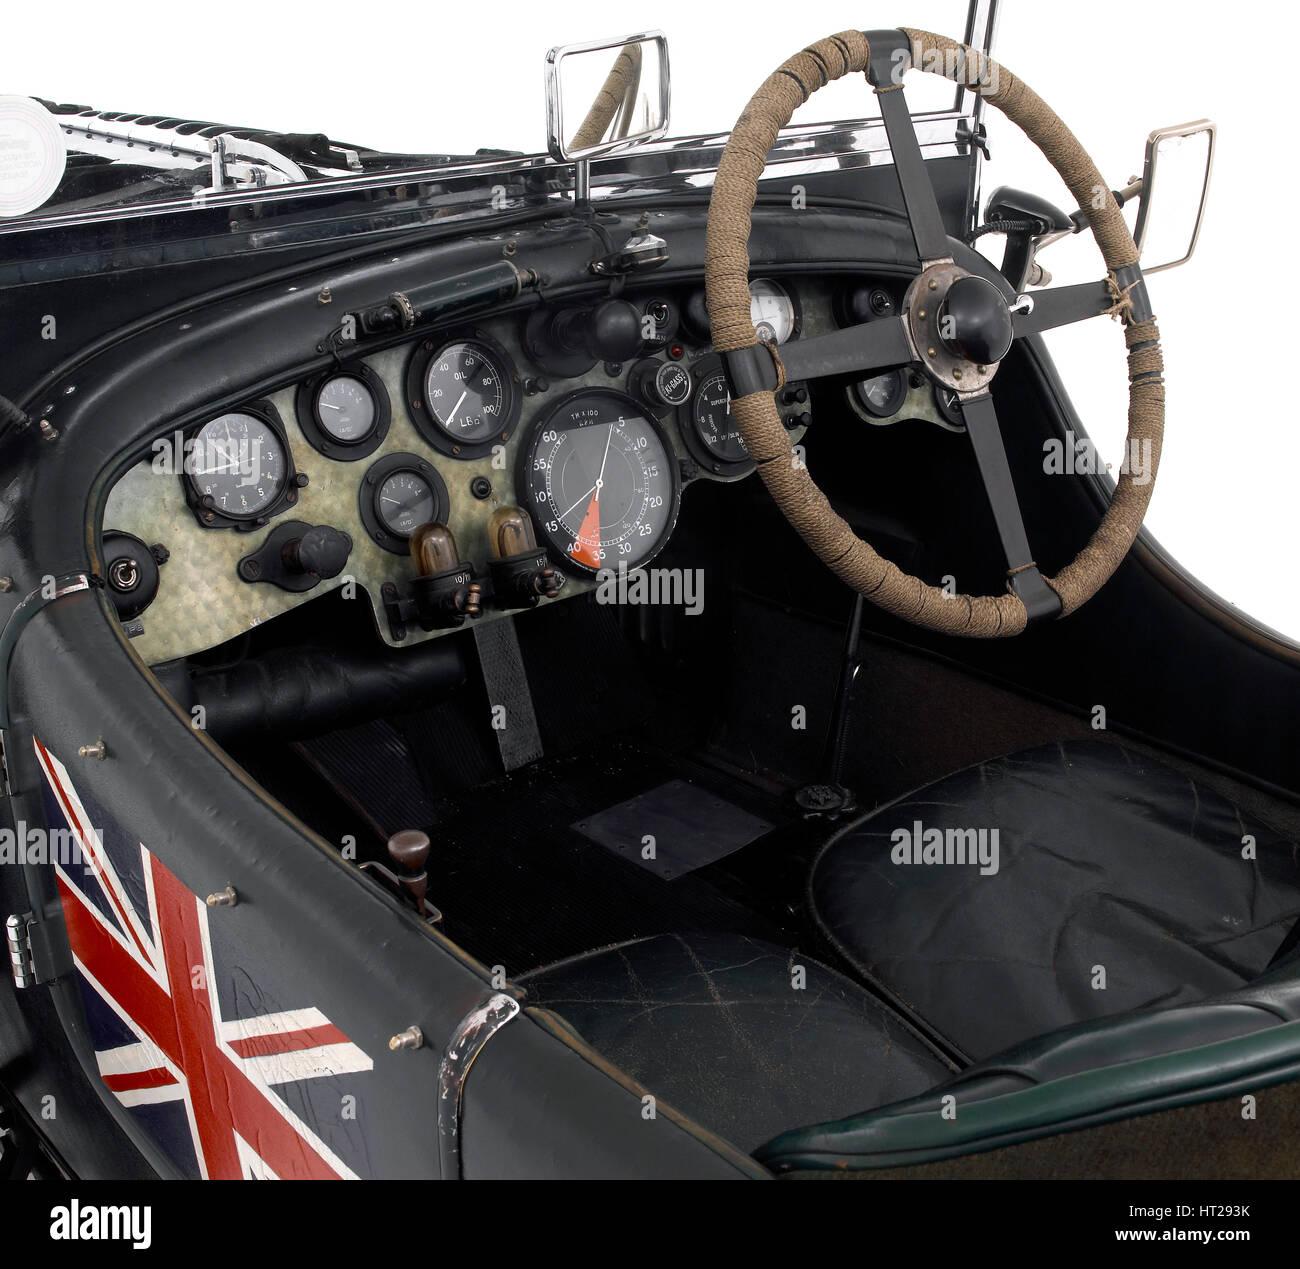 Bentley classic car interior stock photos bentley for National motor club compensation plan